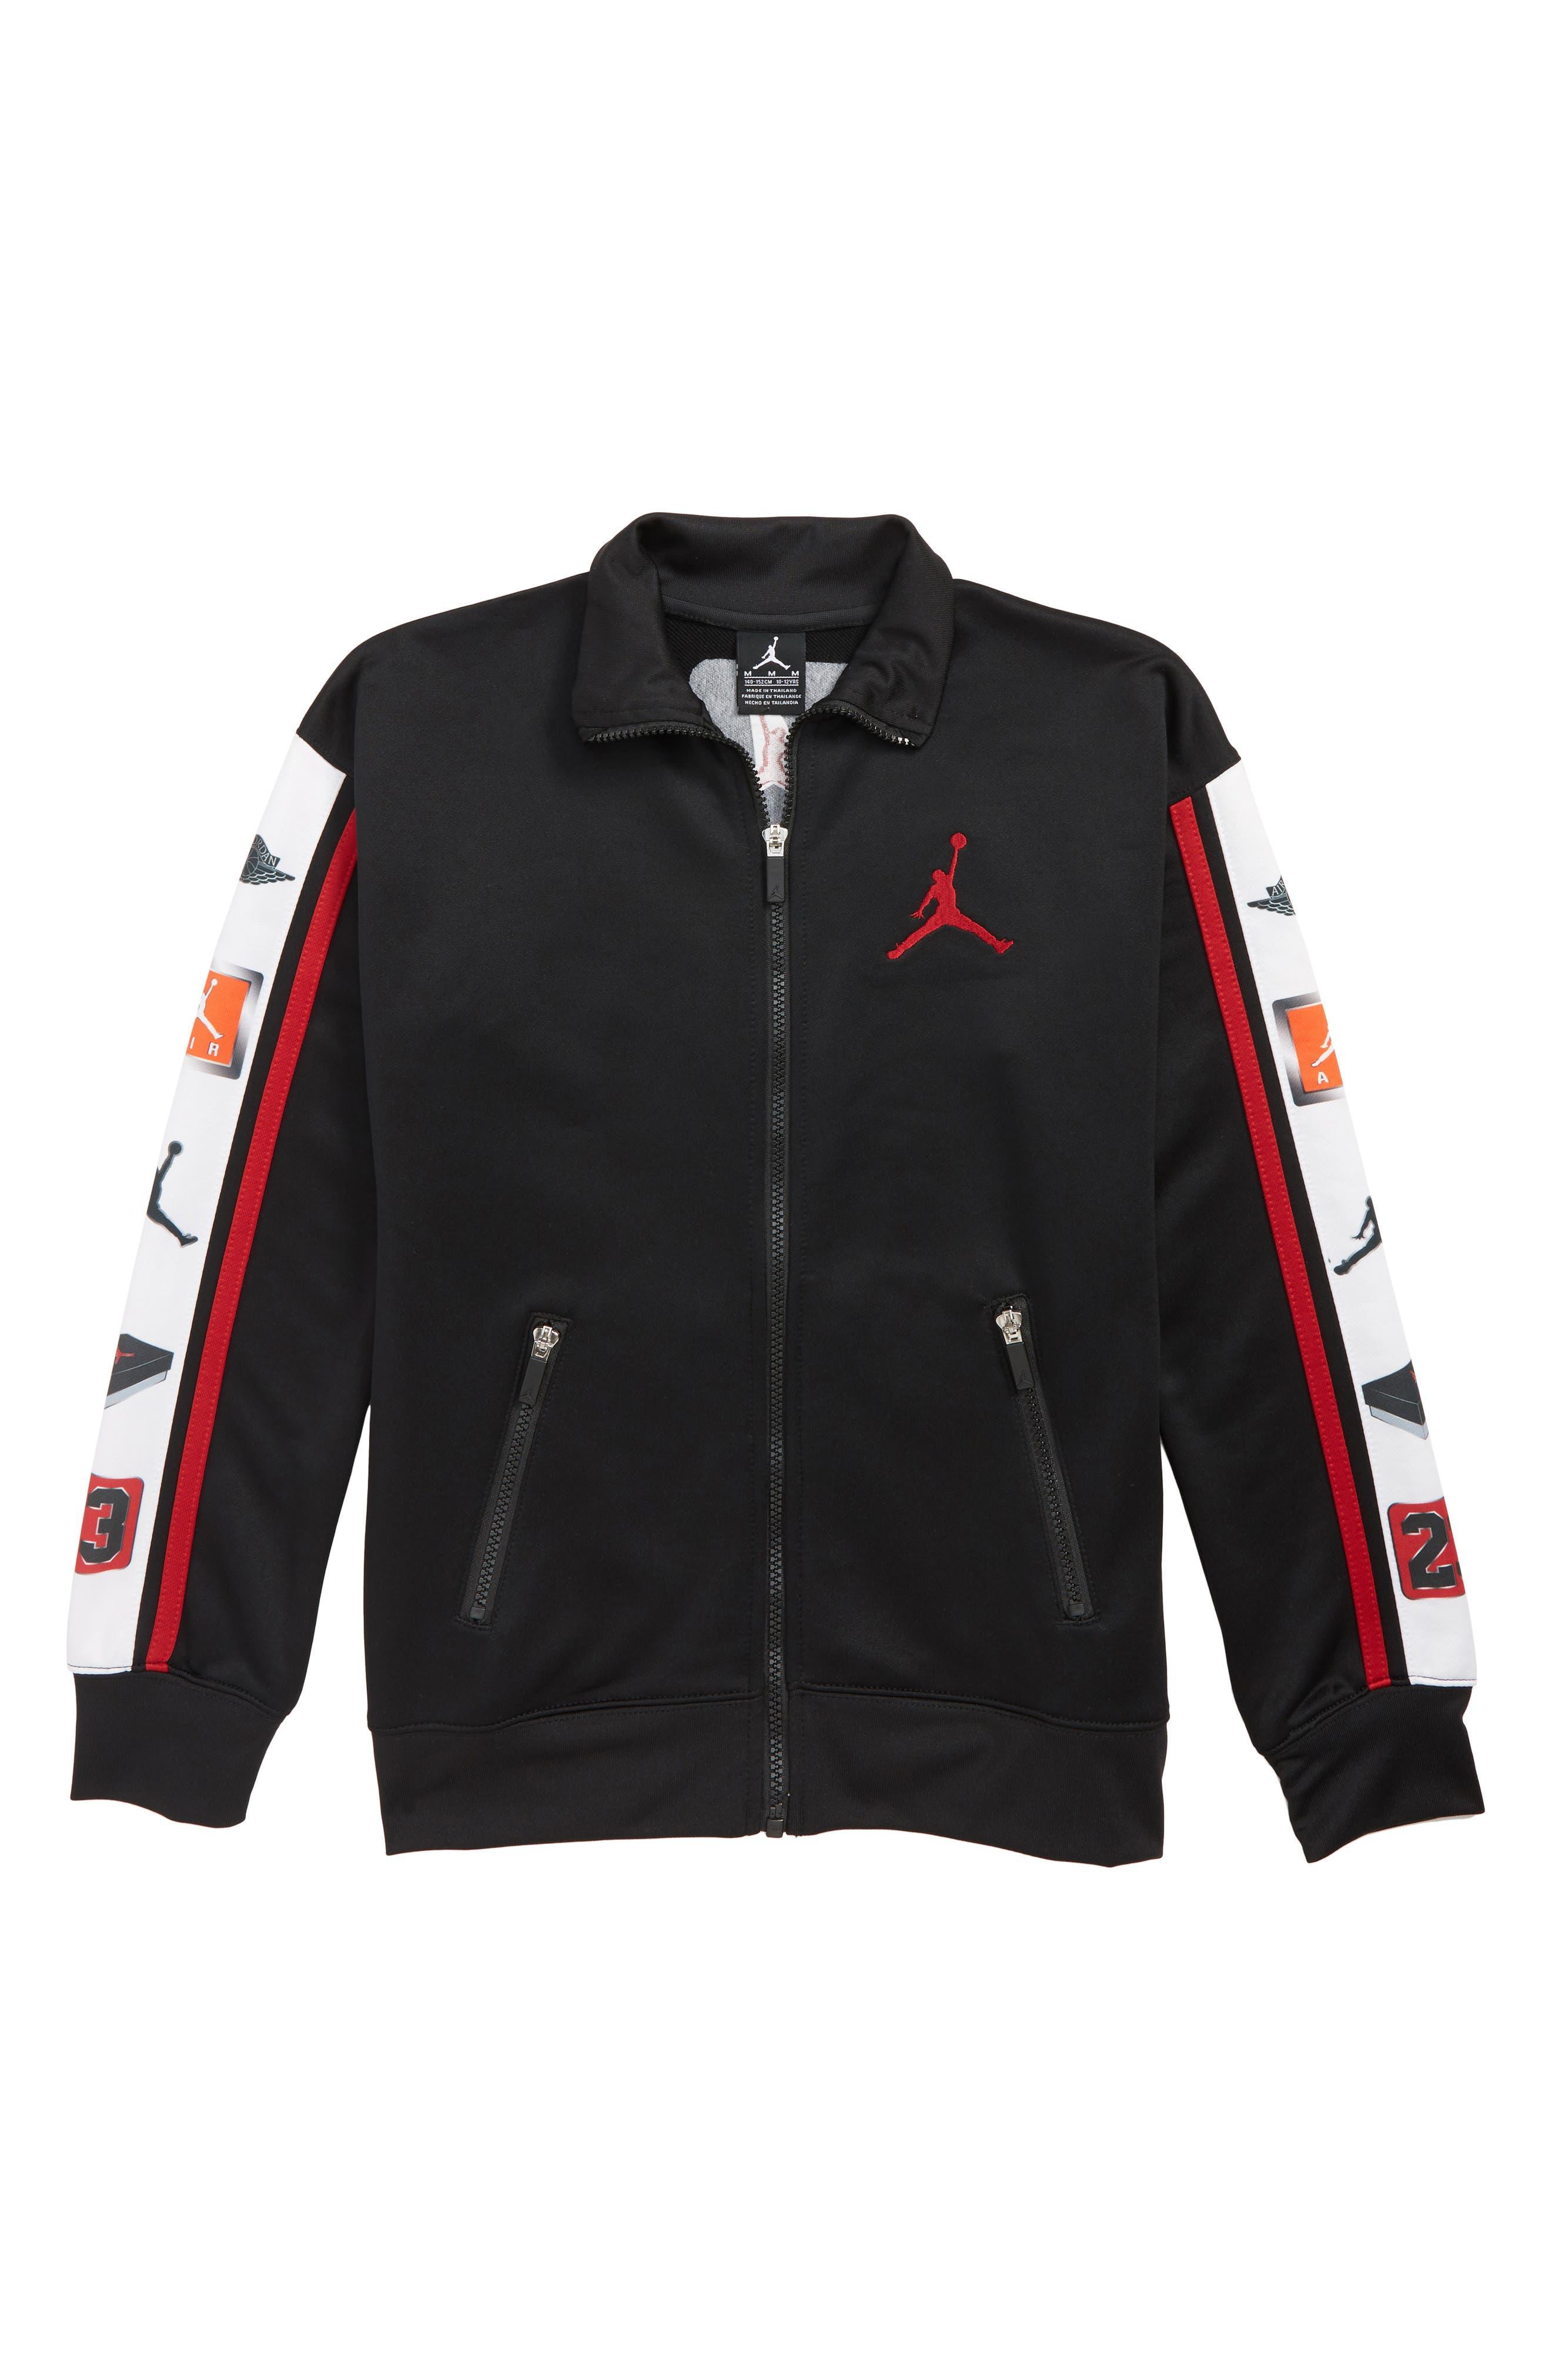 Jordan Celebrity Air Jordan Track Jacket,                         Main,                         color, BLACK